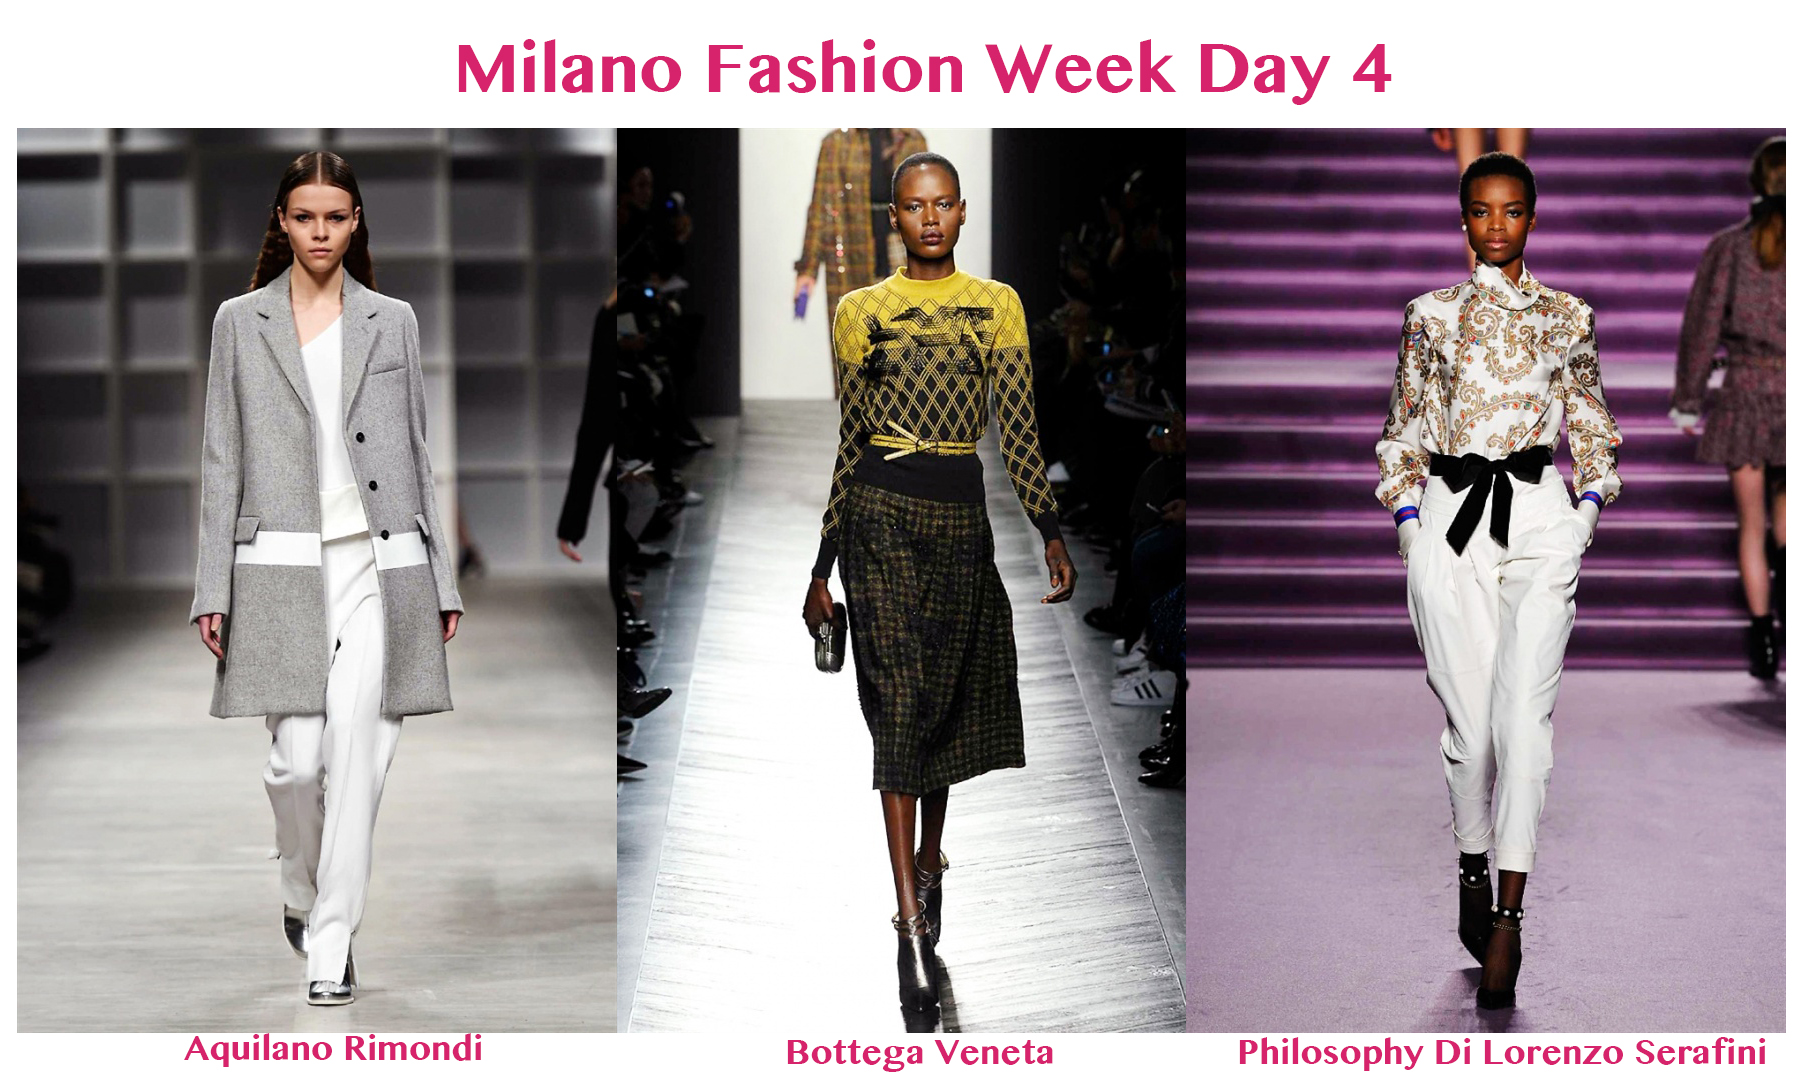 Milano Fashion Week Day 4